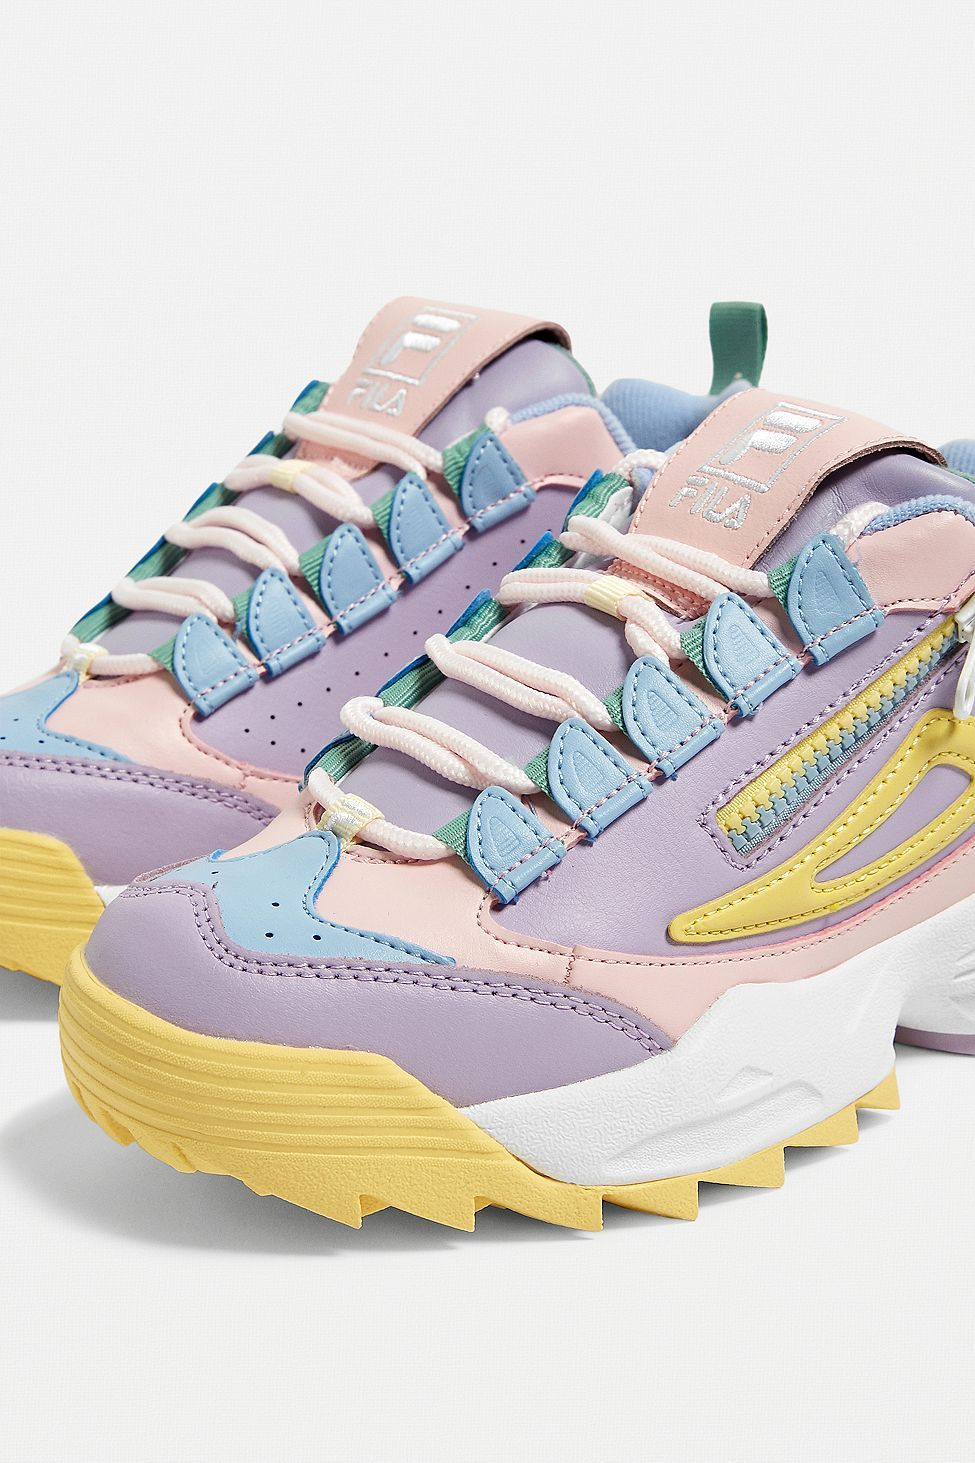 064aa547d3 Fila Disruptors, Sportswear Brand, Nike Huarache, Shoes Sneakers, Trainers,  Zip,